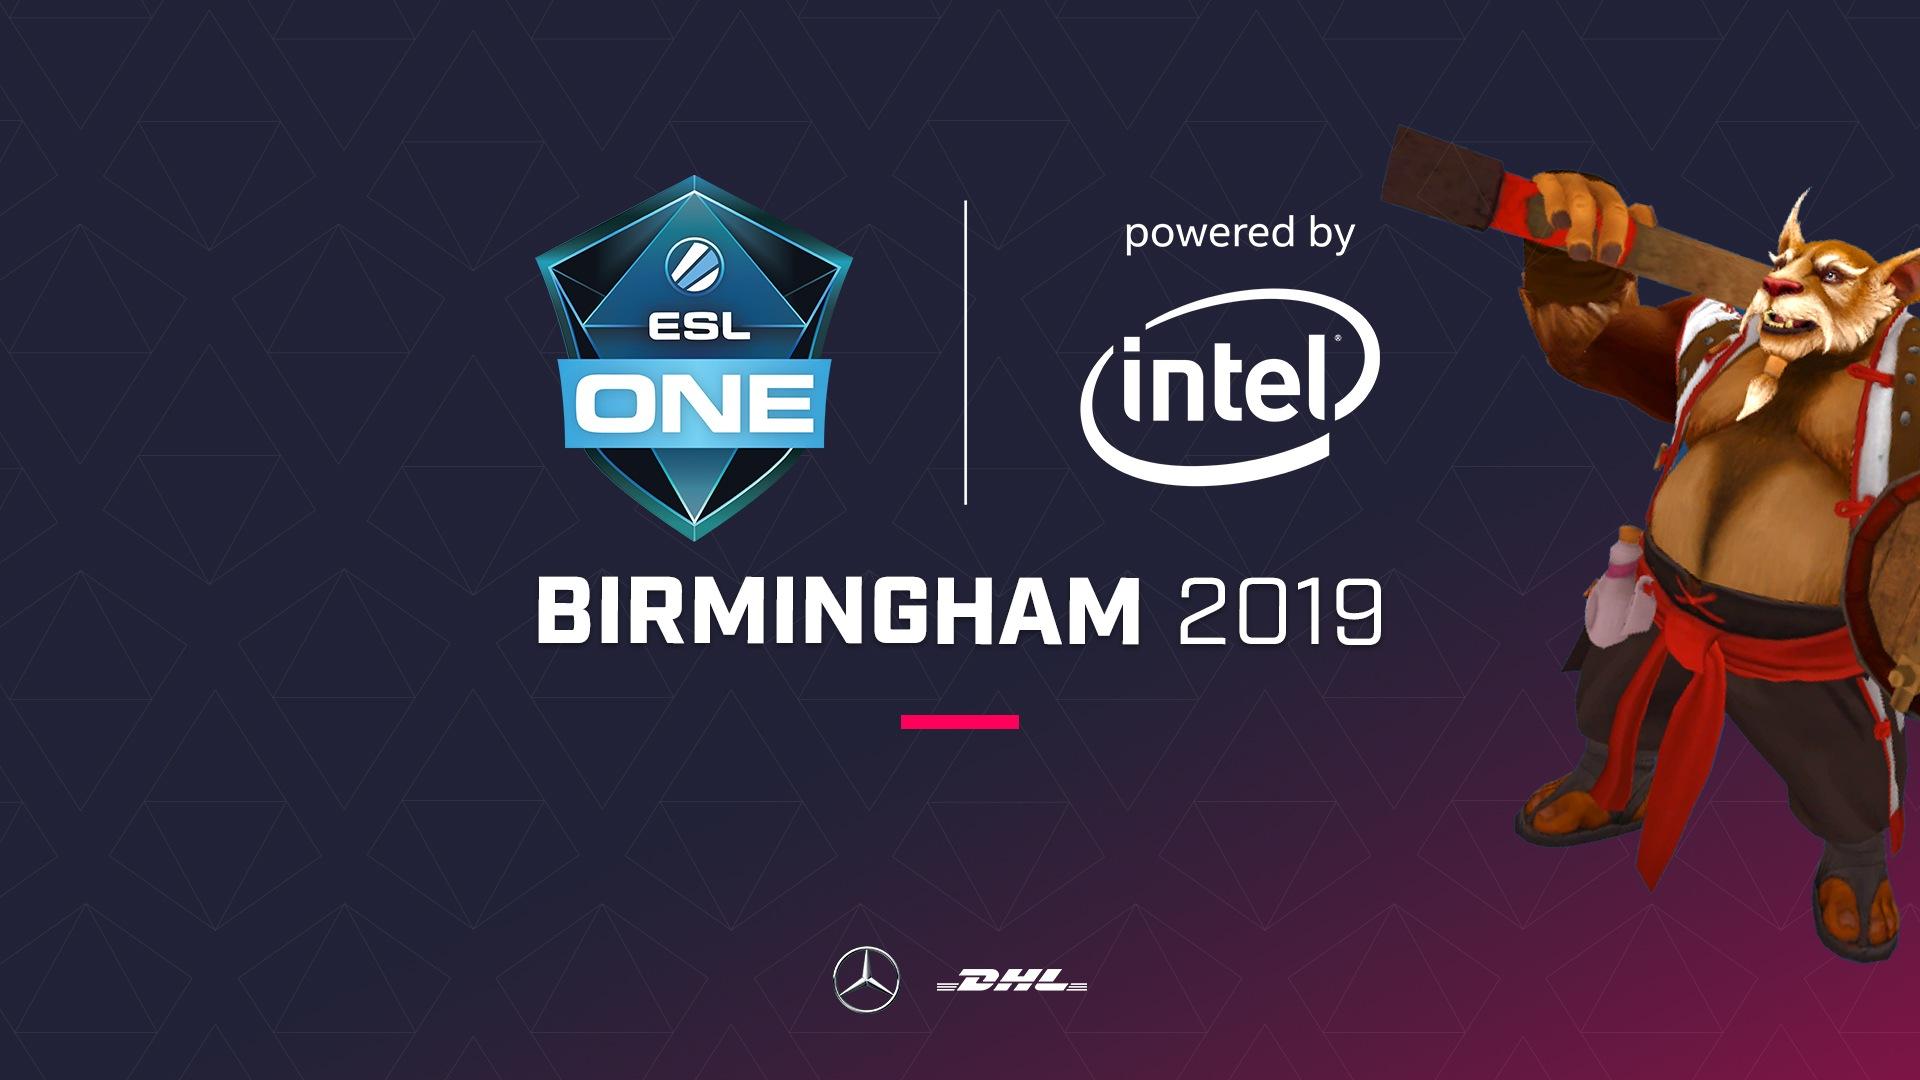 ESL Dota 2 returns to UK with ESL One Birmingham 2019